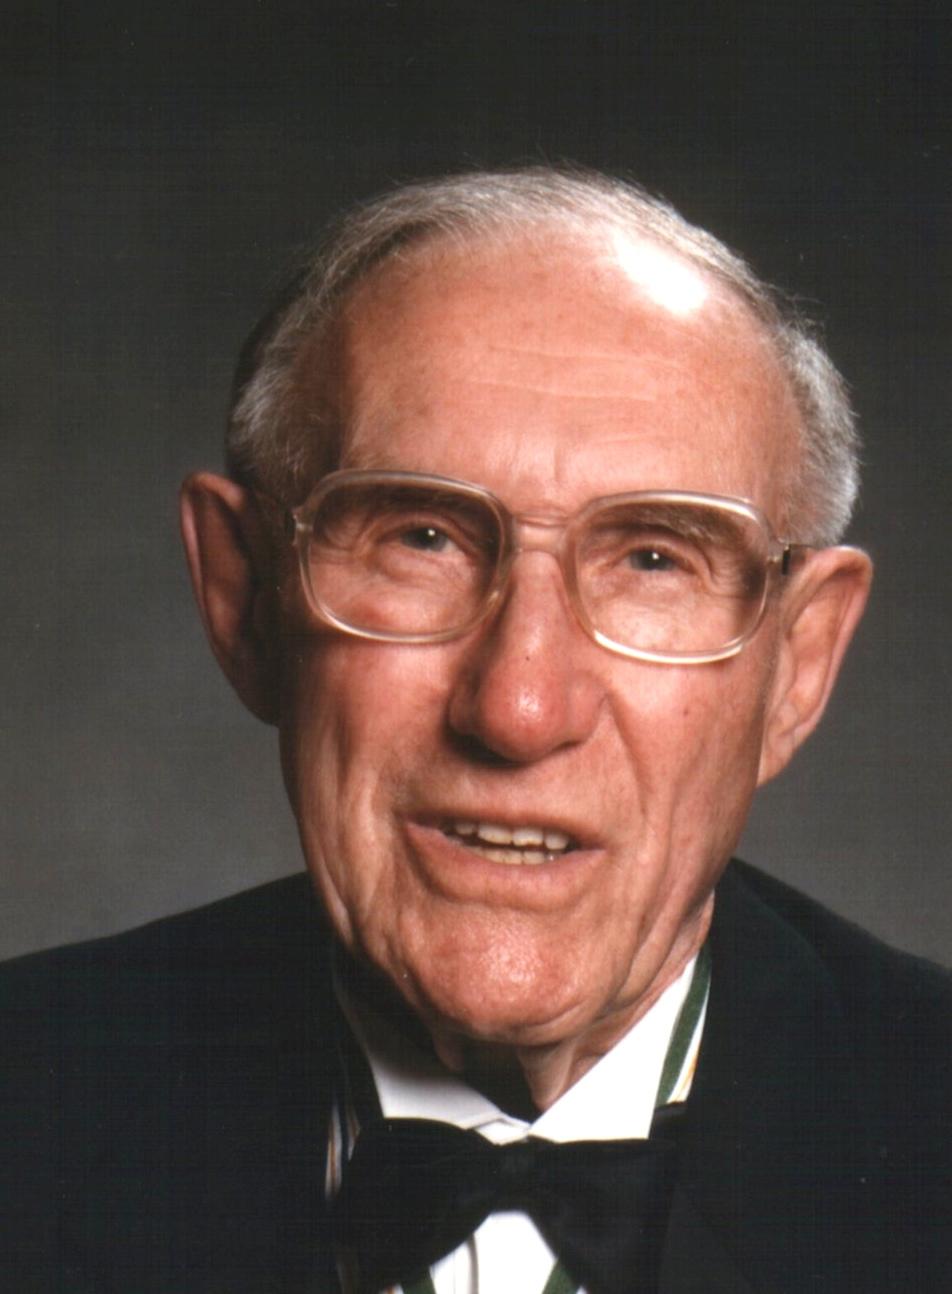 Erwin Swangard